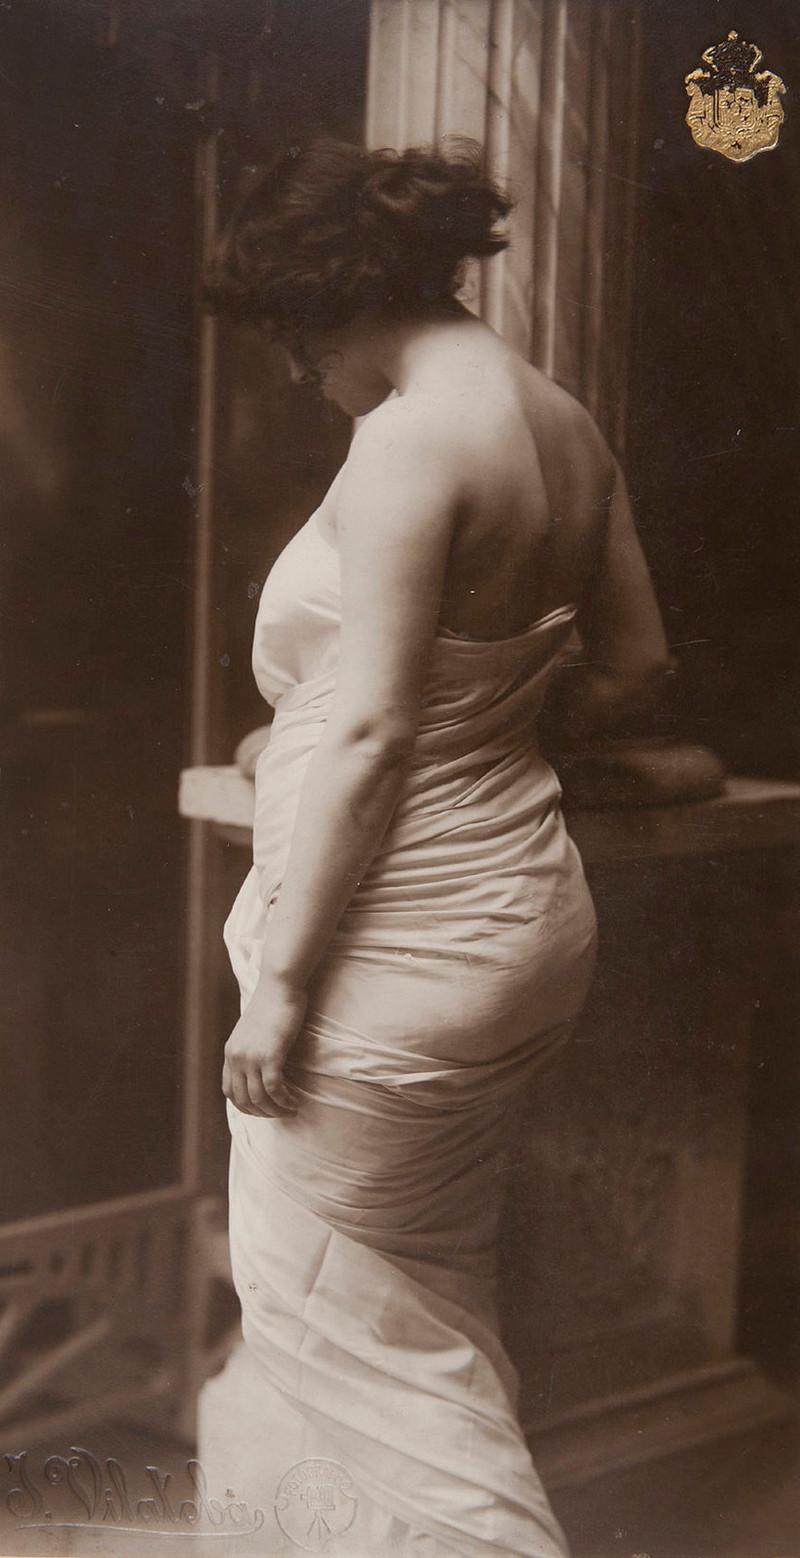 Снимки от пионера фотографии Джоана Вилатоба